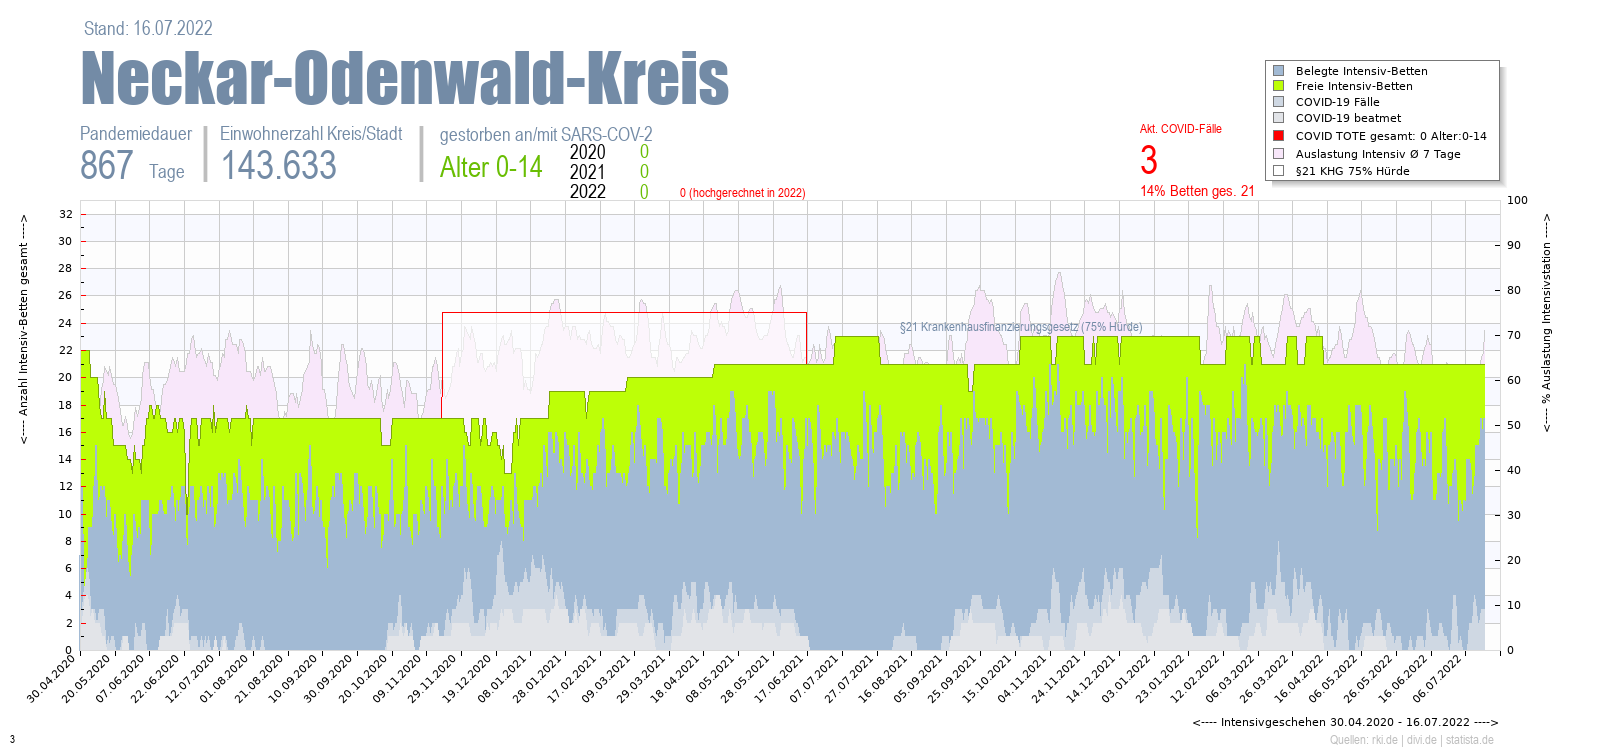 Intensivstation Auslastung Neckar-Odenwald-Kreis Alter 0-4